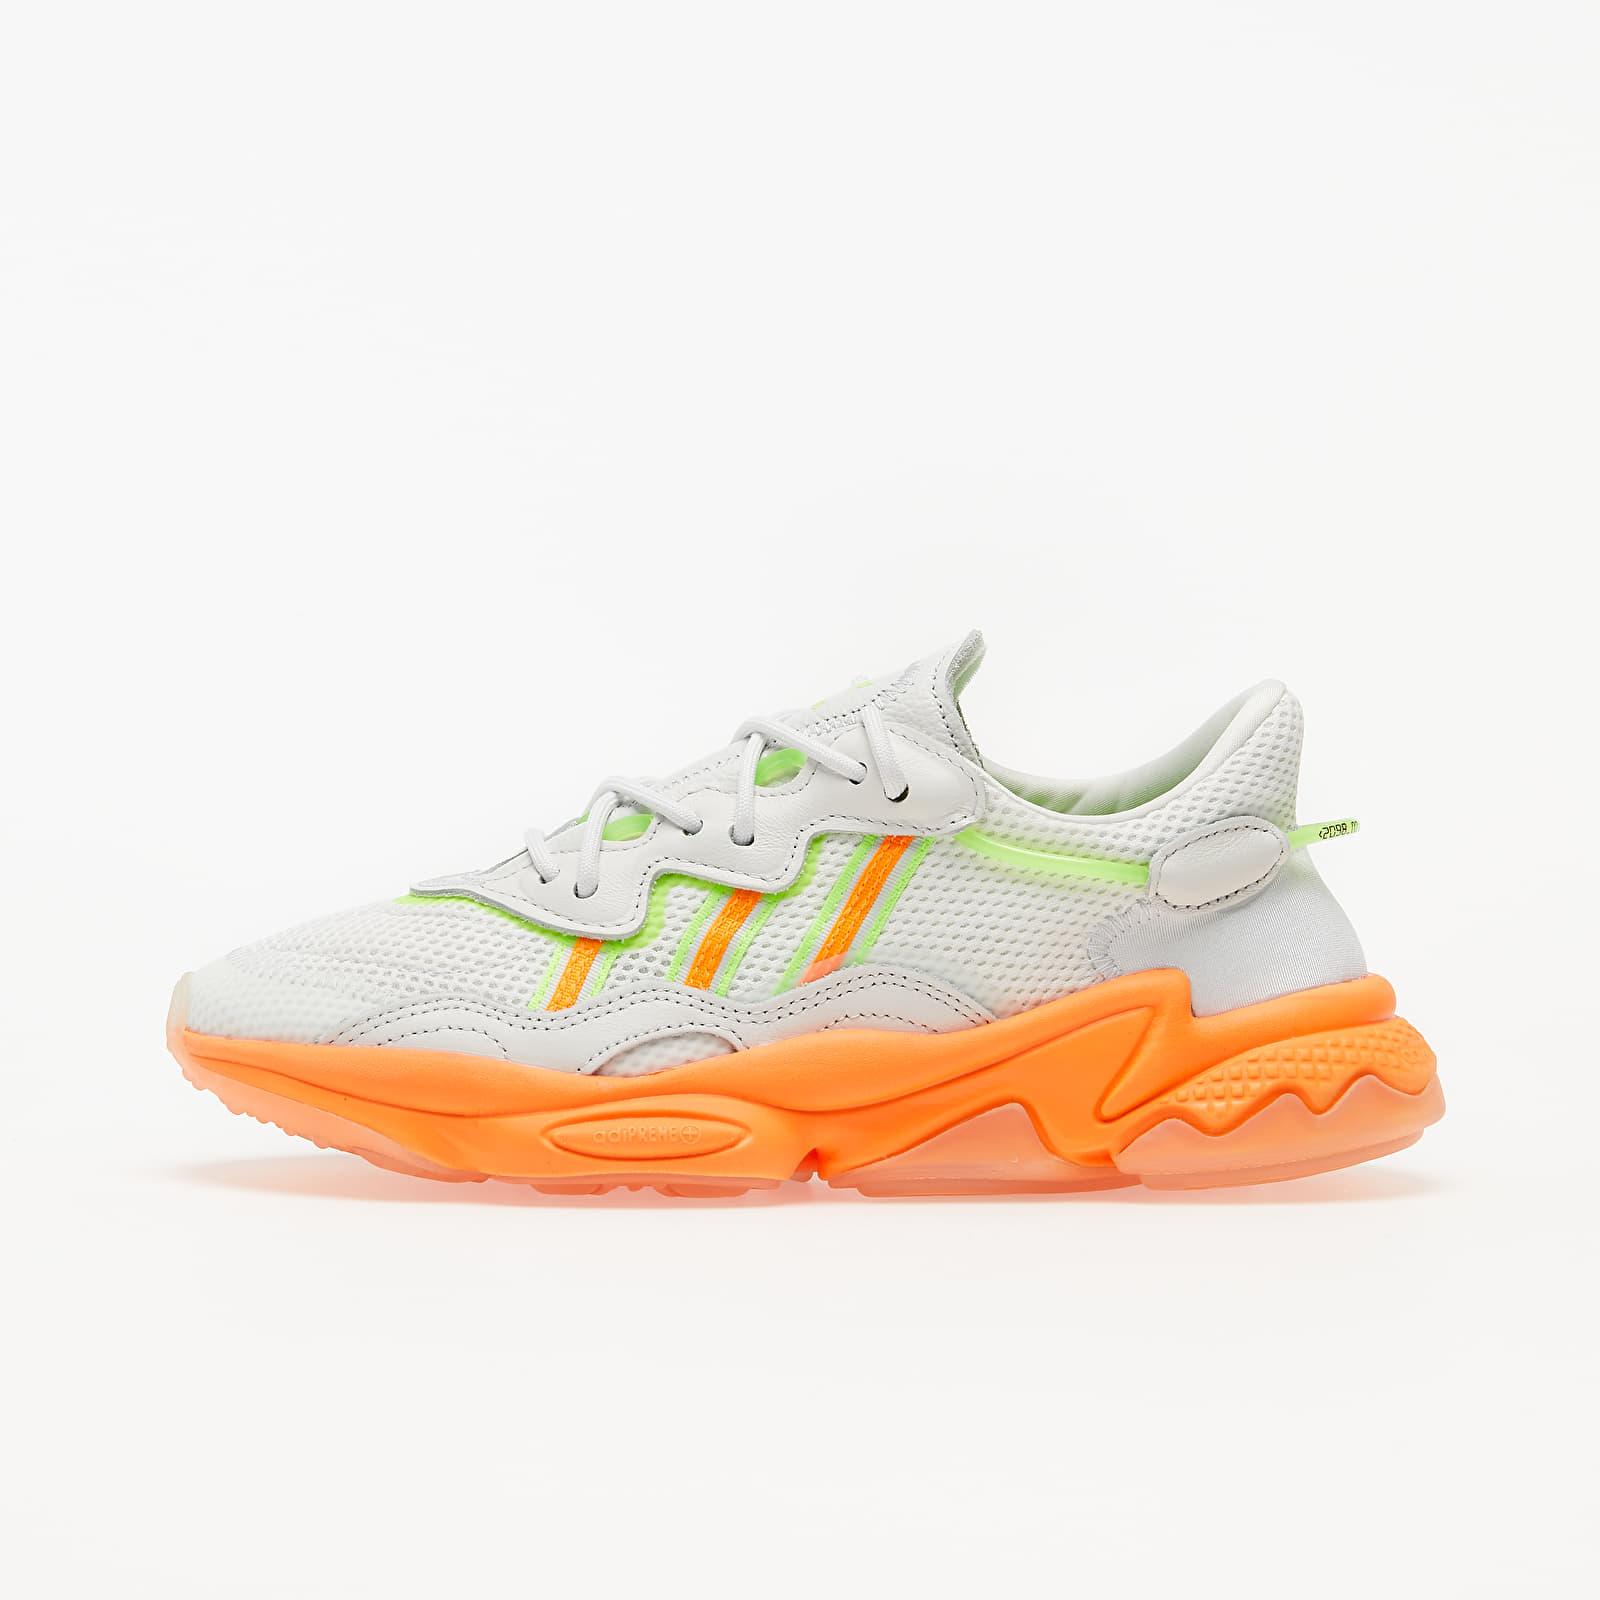 Women's shoes adidas Ozweego W Crystal